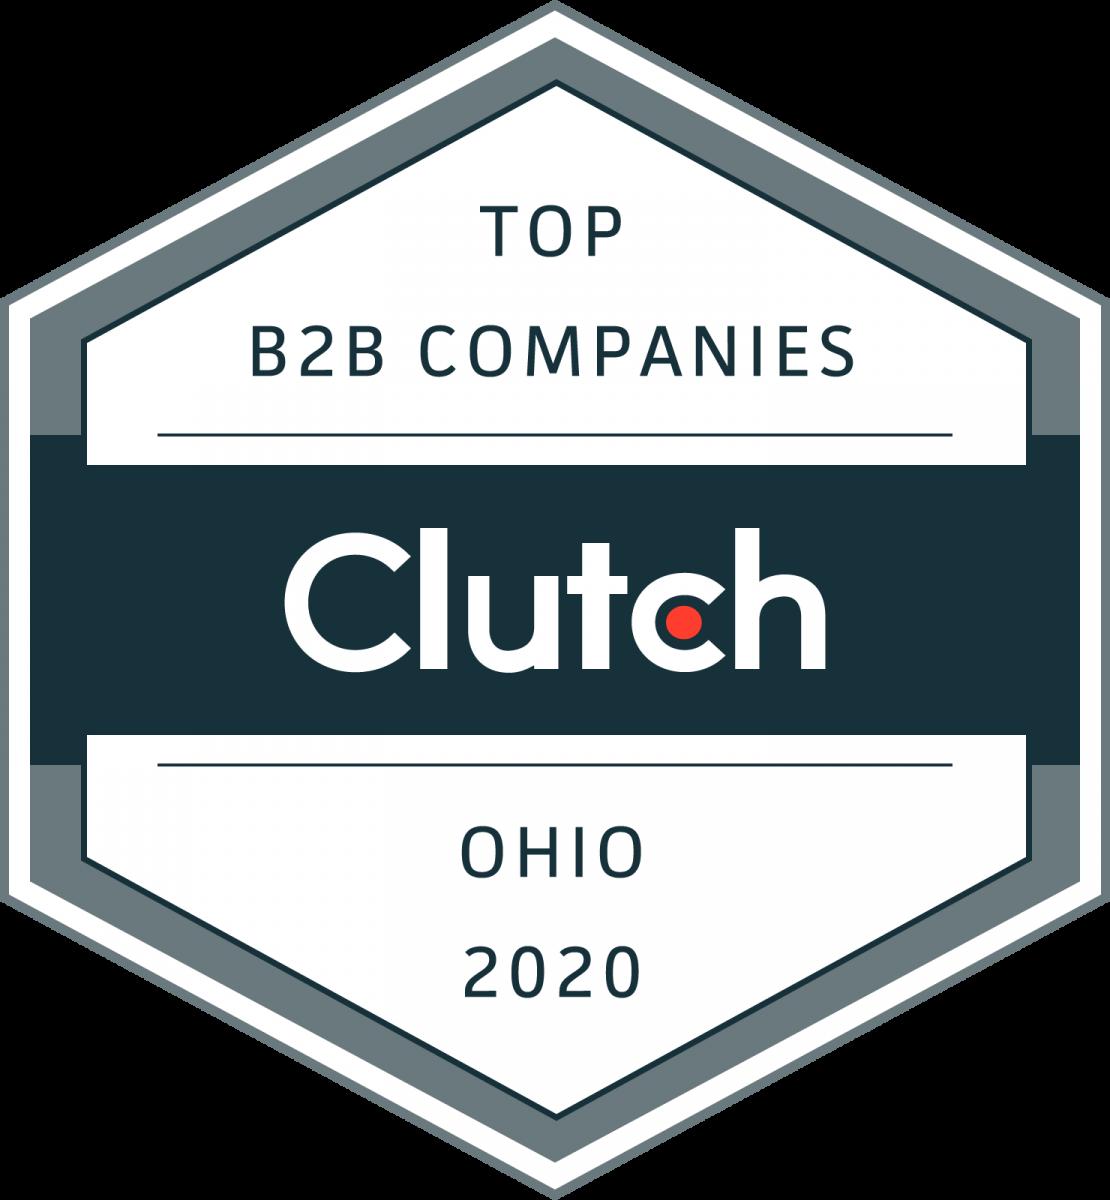 Top B2B Companies Ohio